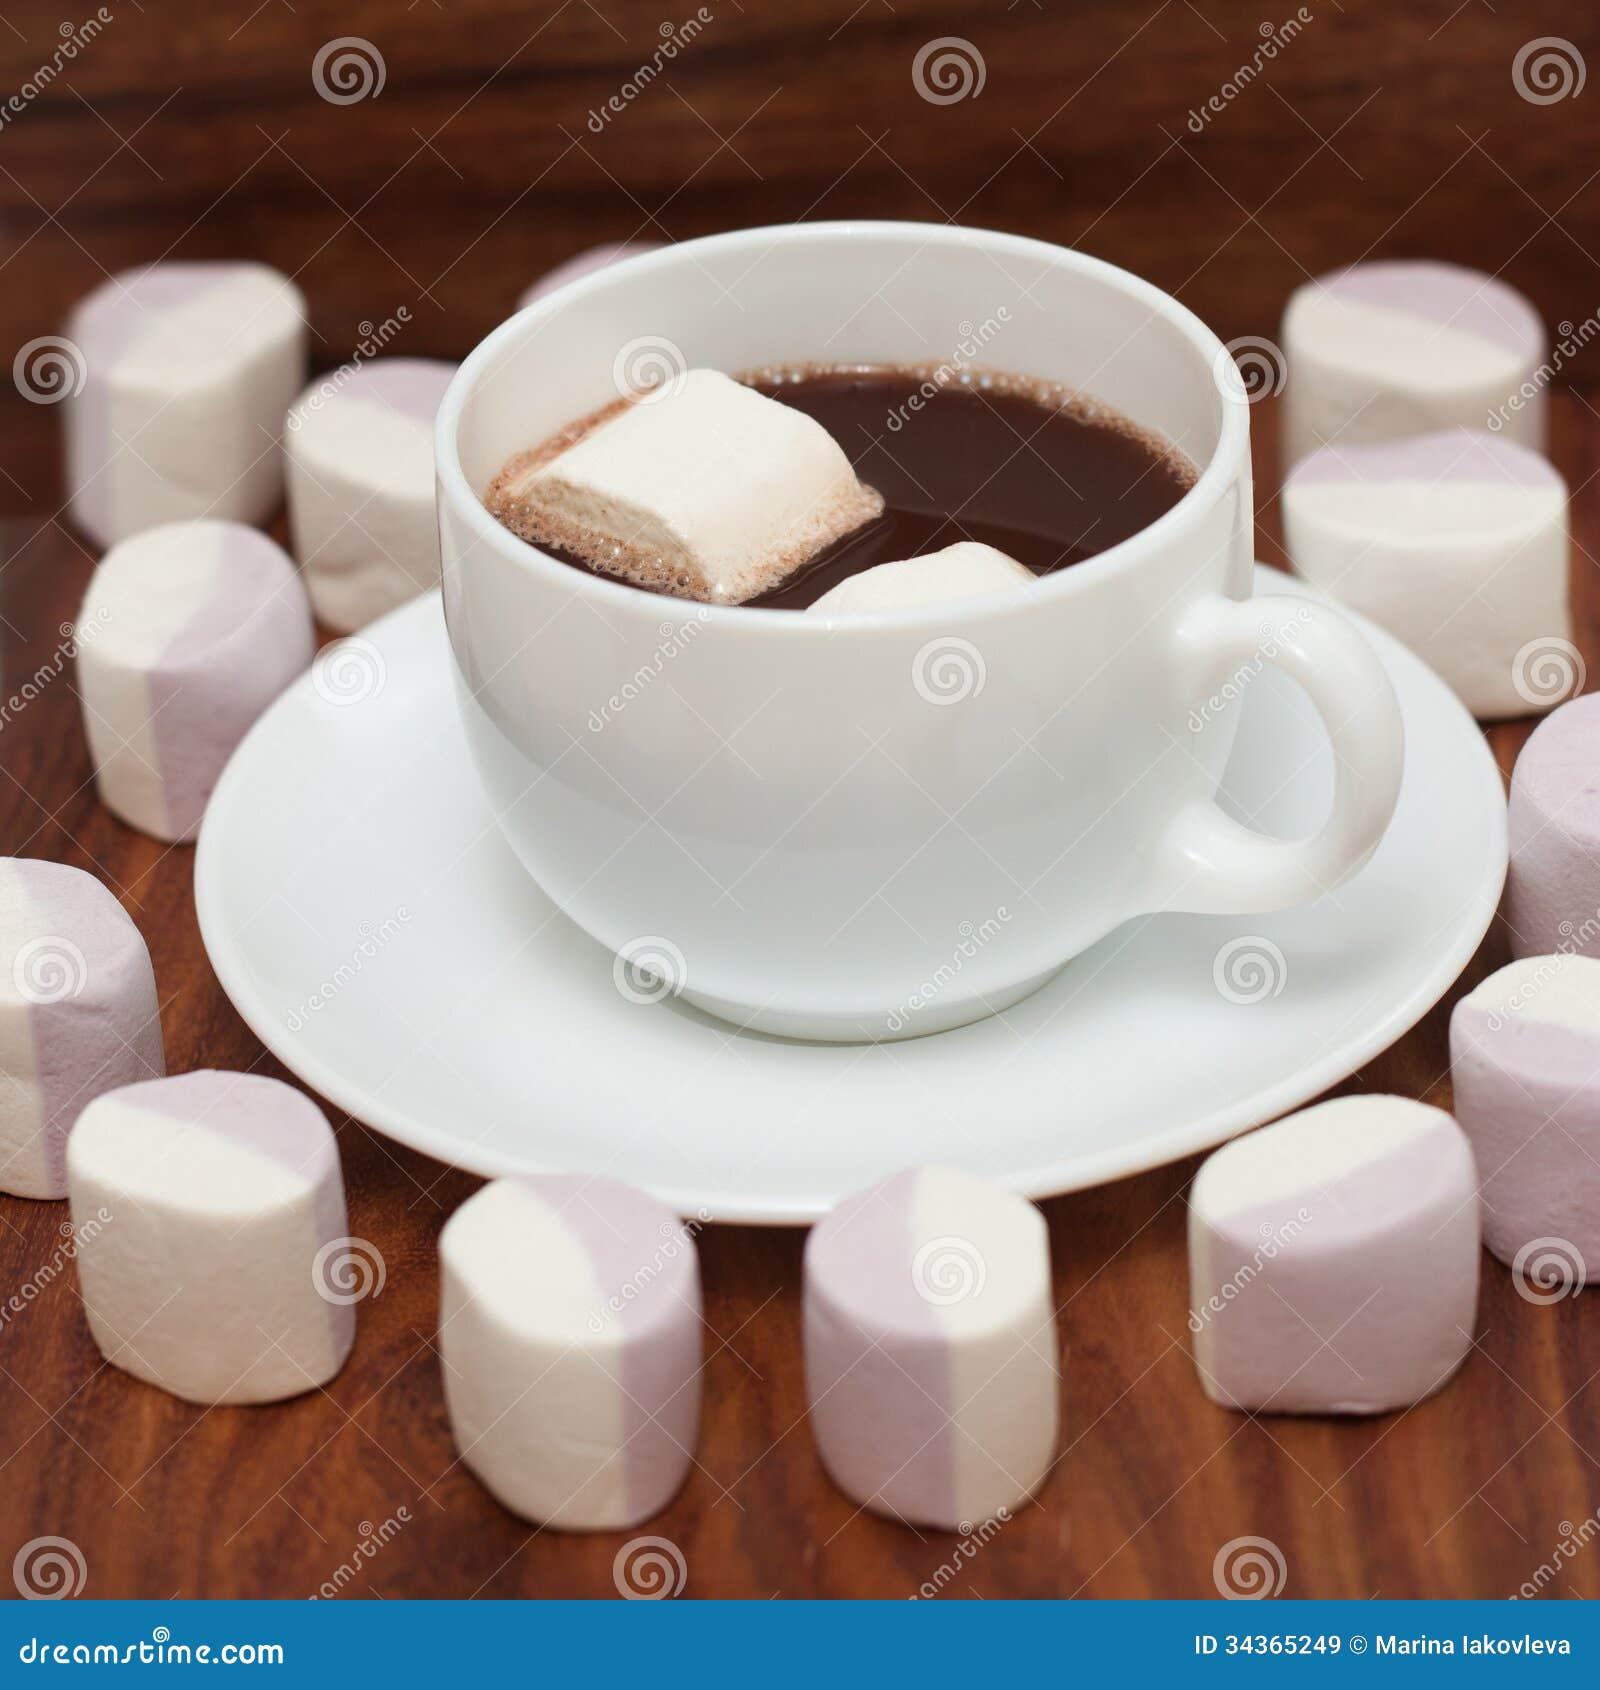 Chocolate Marshmellow Background Free